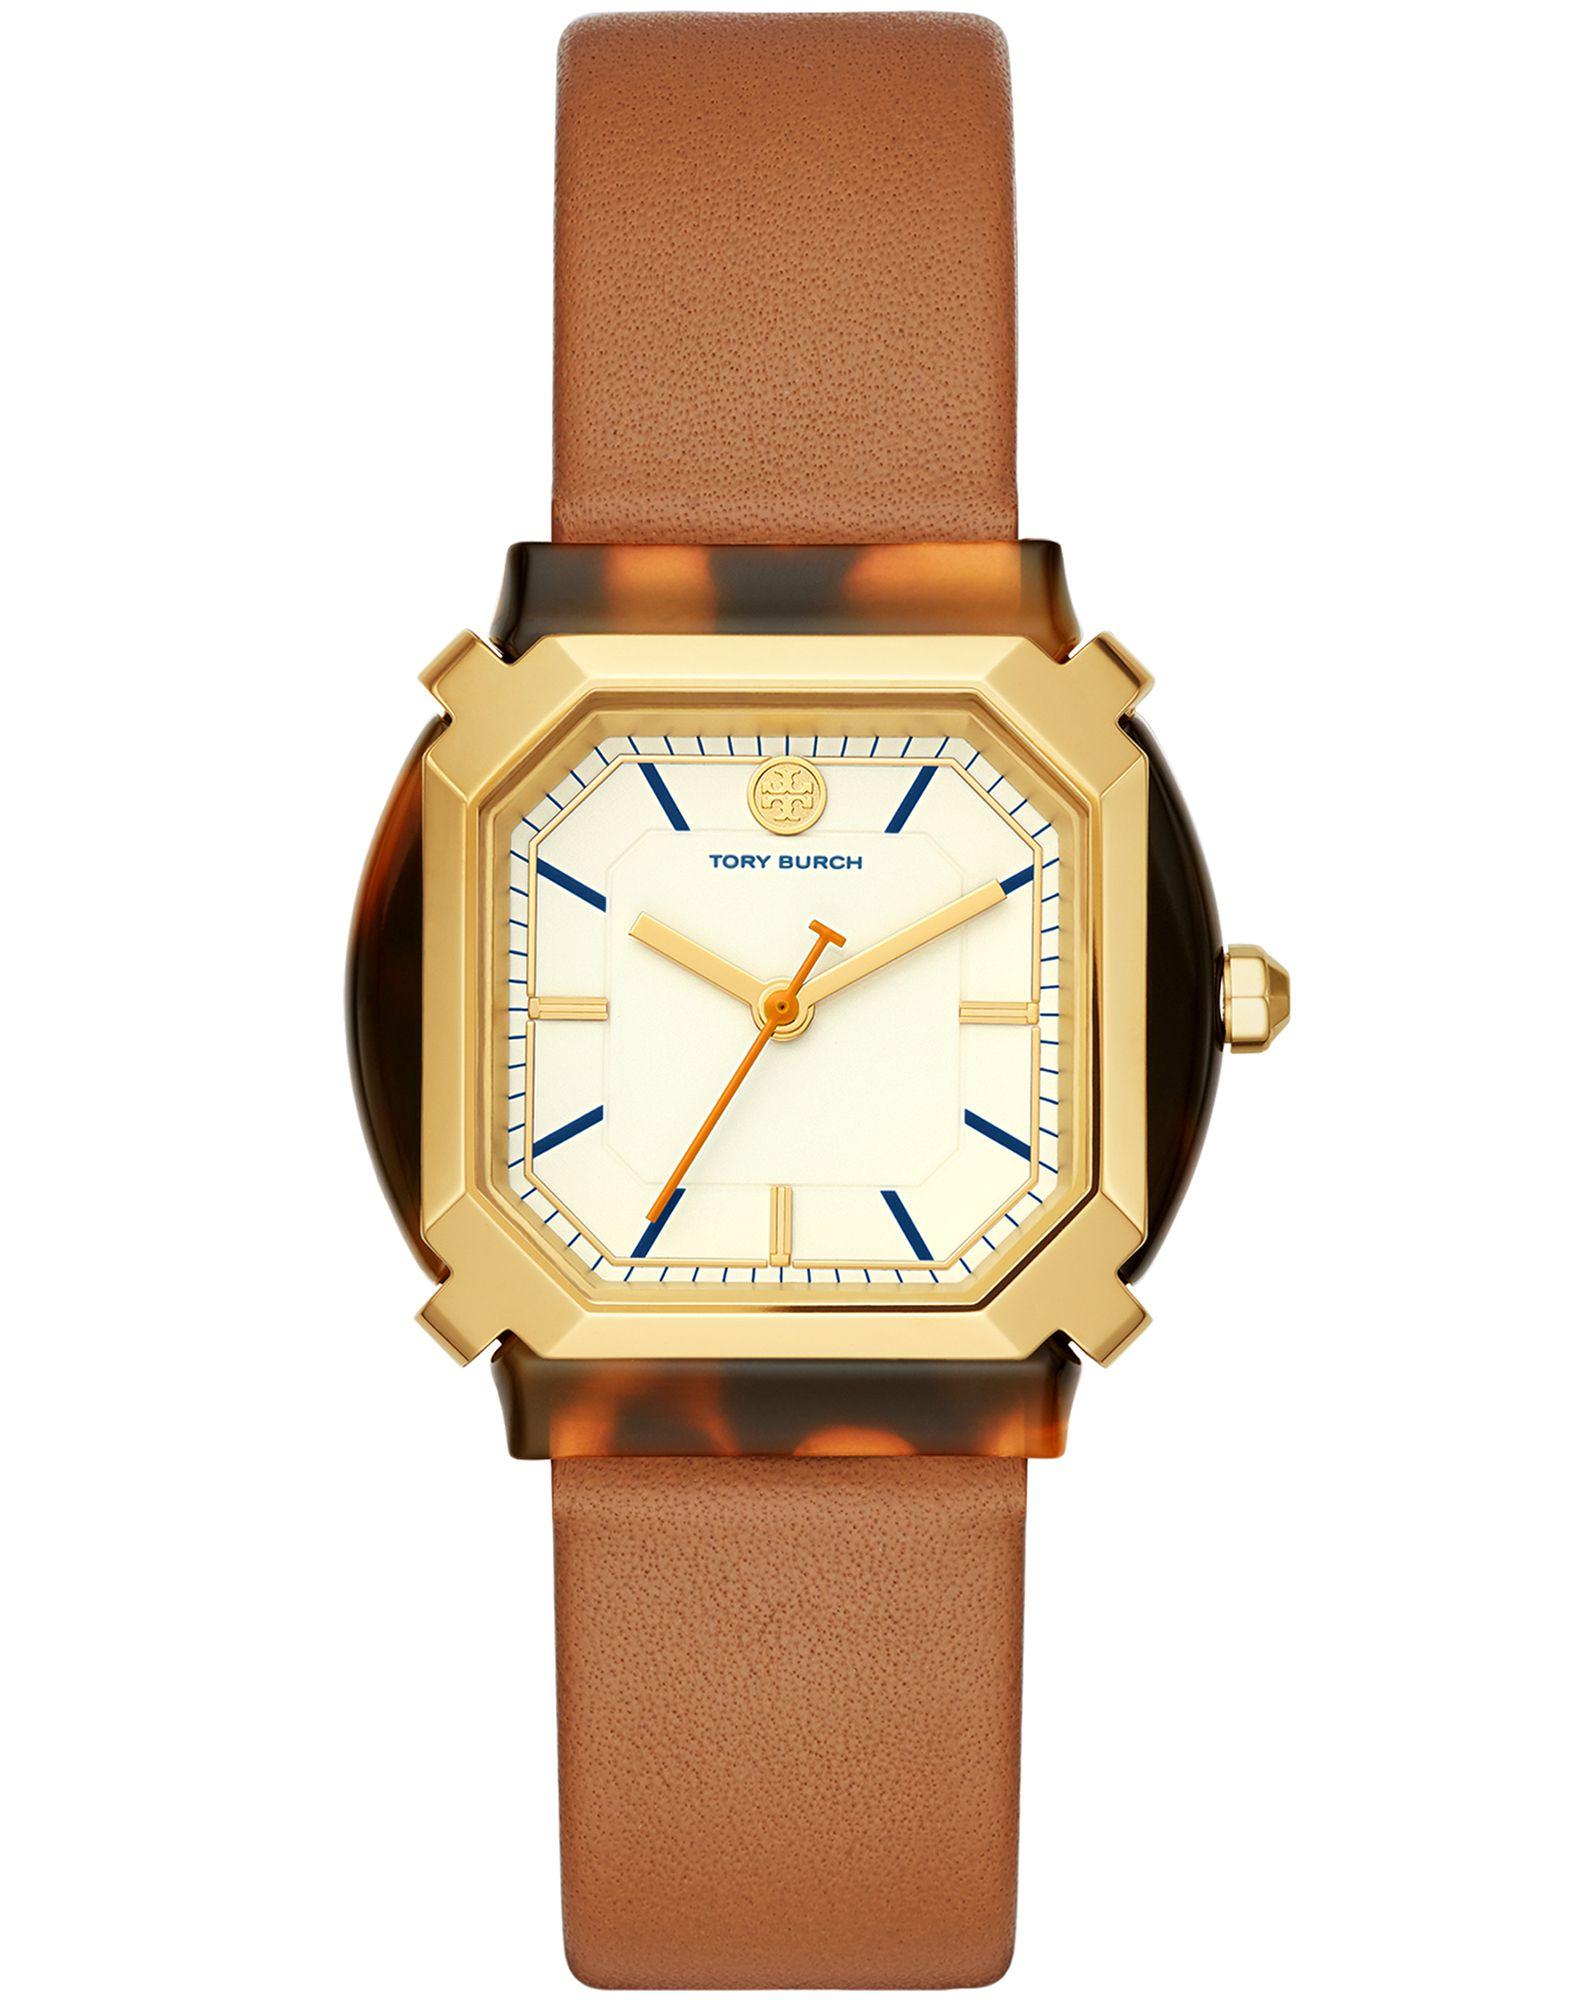 TORY BURCH Wrist watches - Item 58050804